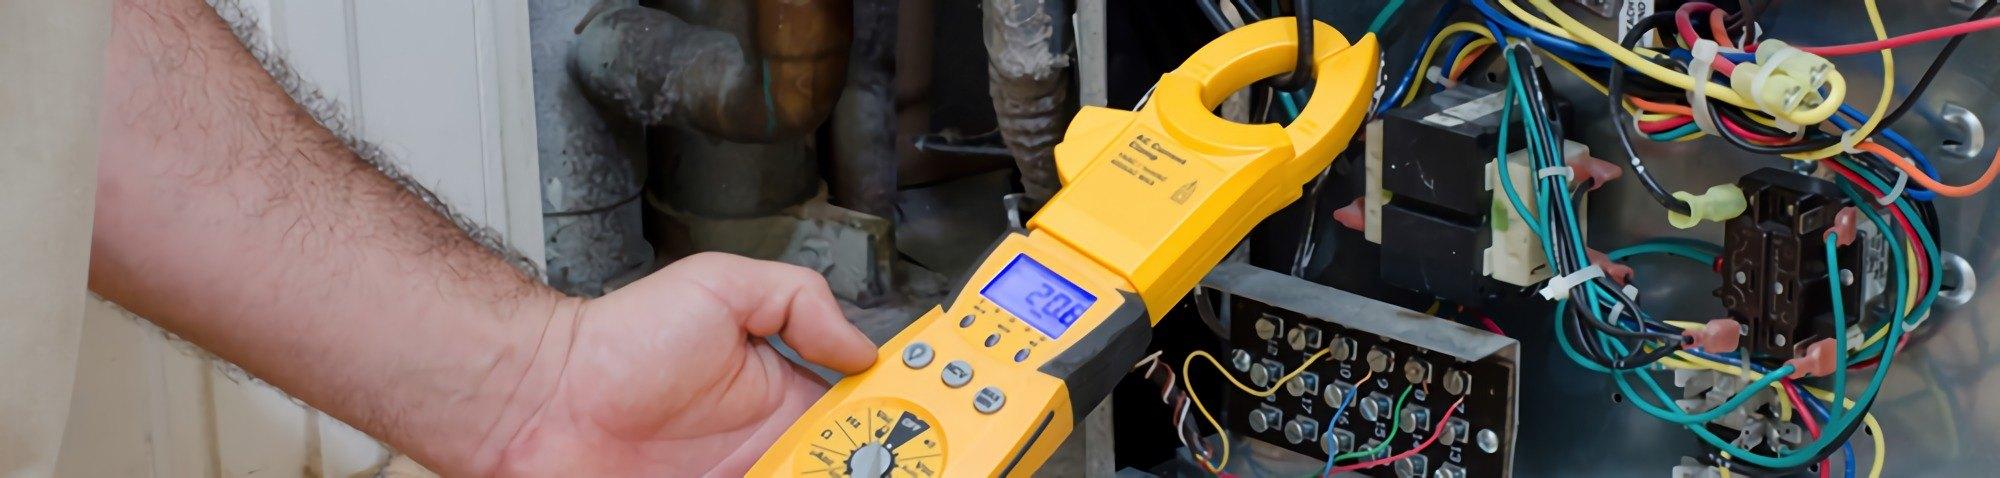 HVAC technician safety training